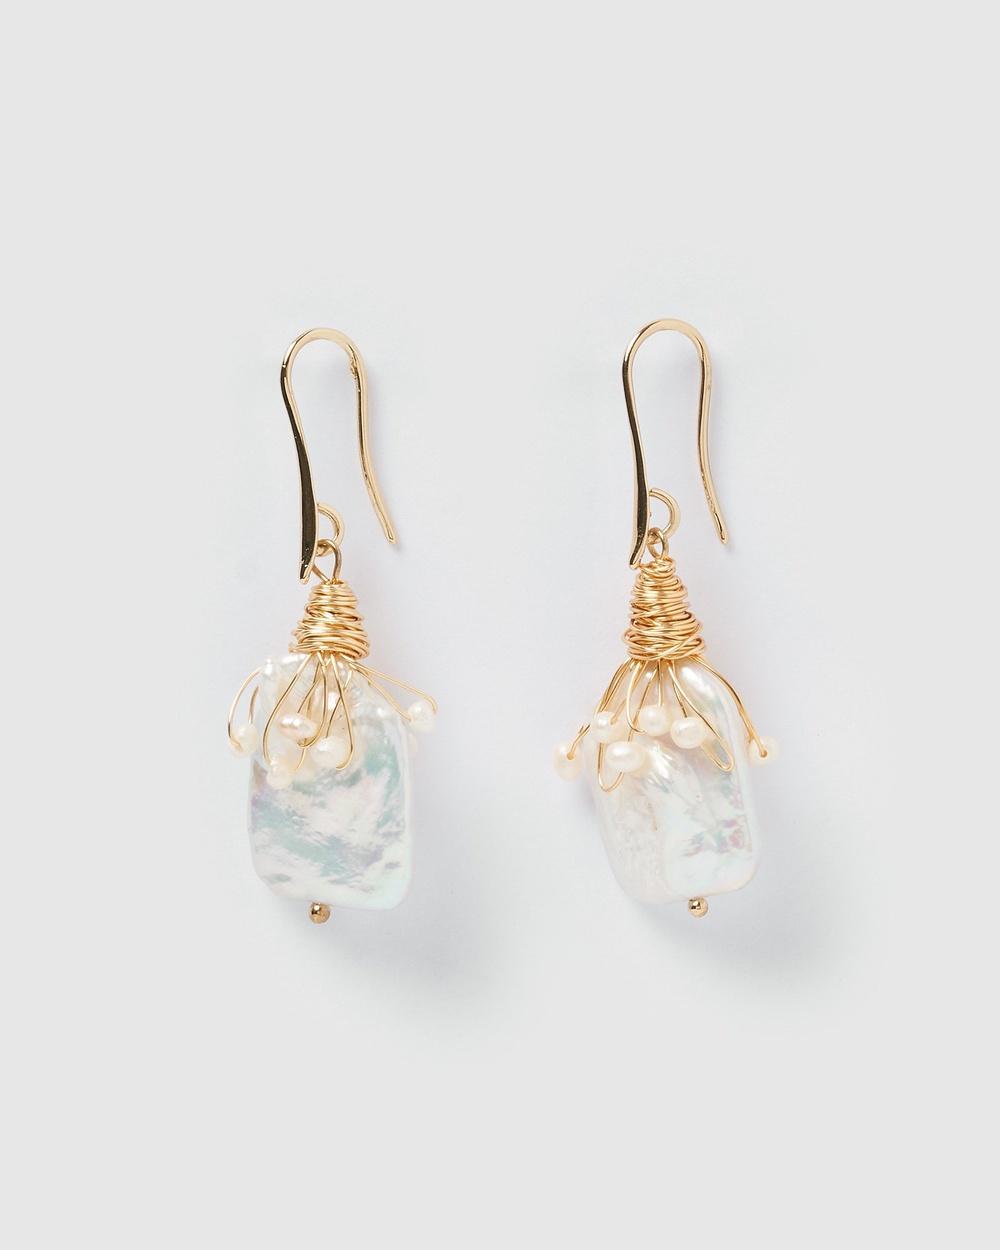 Miz Casa and Co Heiress Pearl Drop Earrings Jewellery Gold Pearl